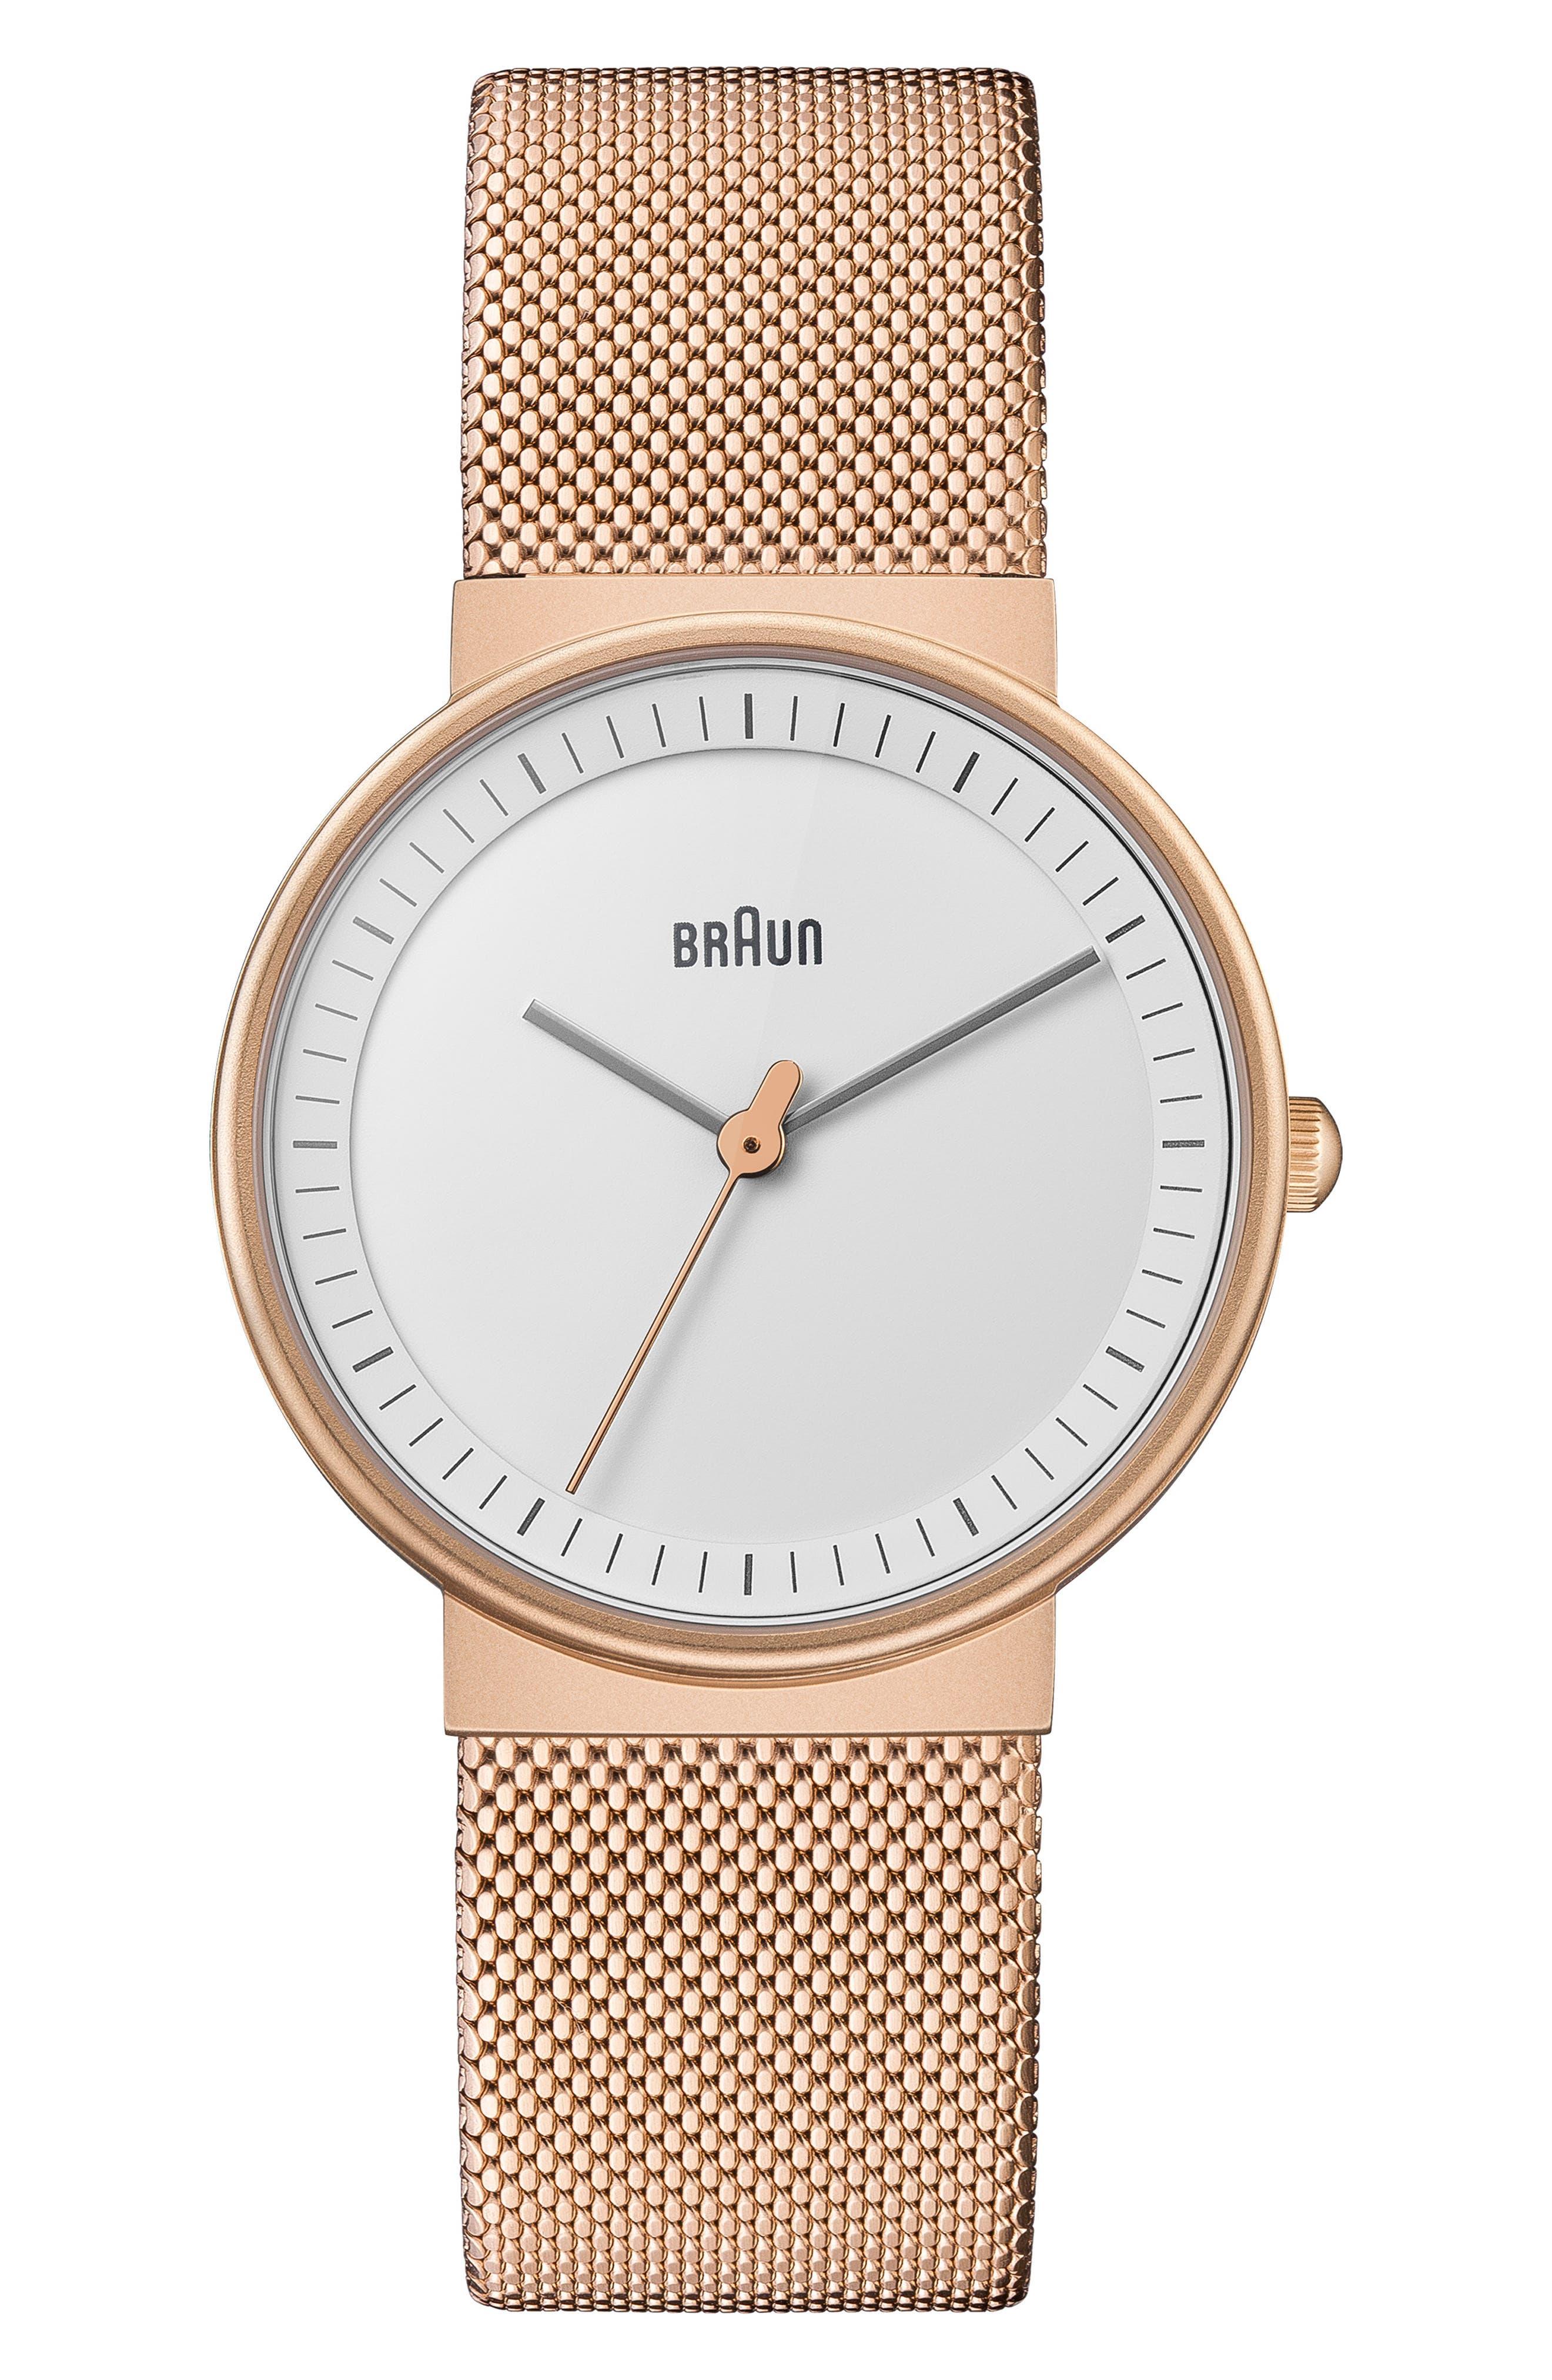 BRAUN Classic Mesh Bracelet Watch, 33Mm in Rose Gold/ White/ Rose Gold